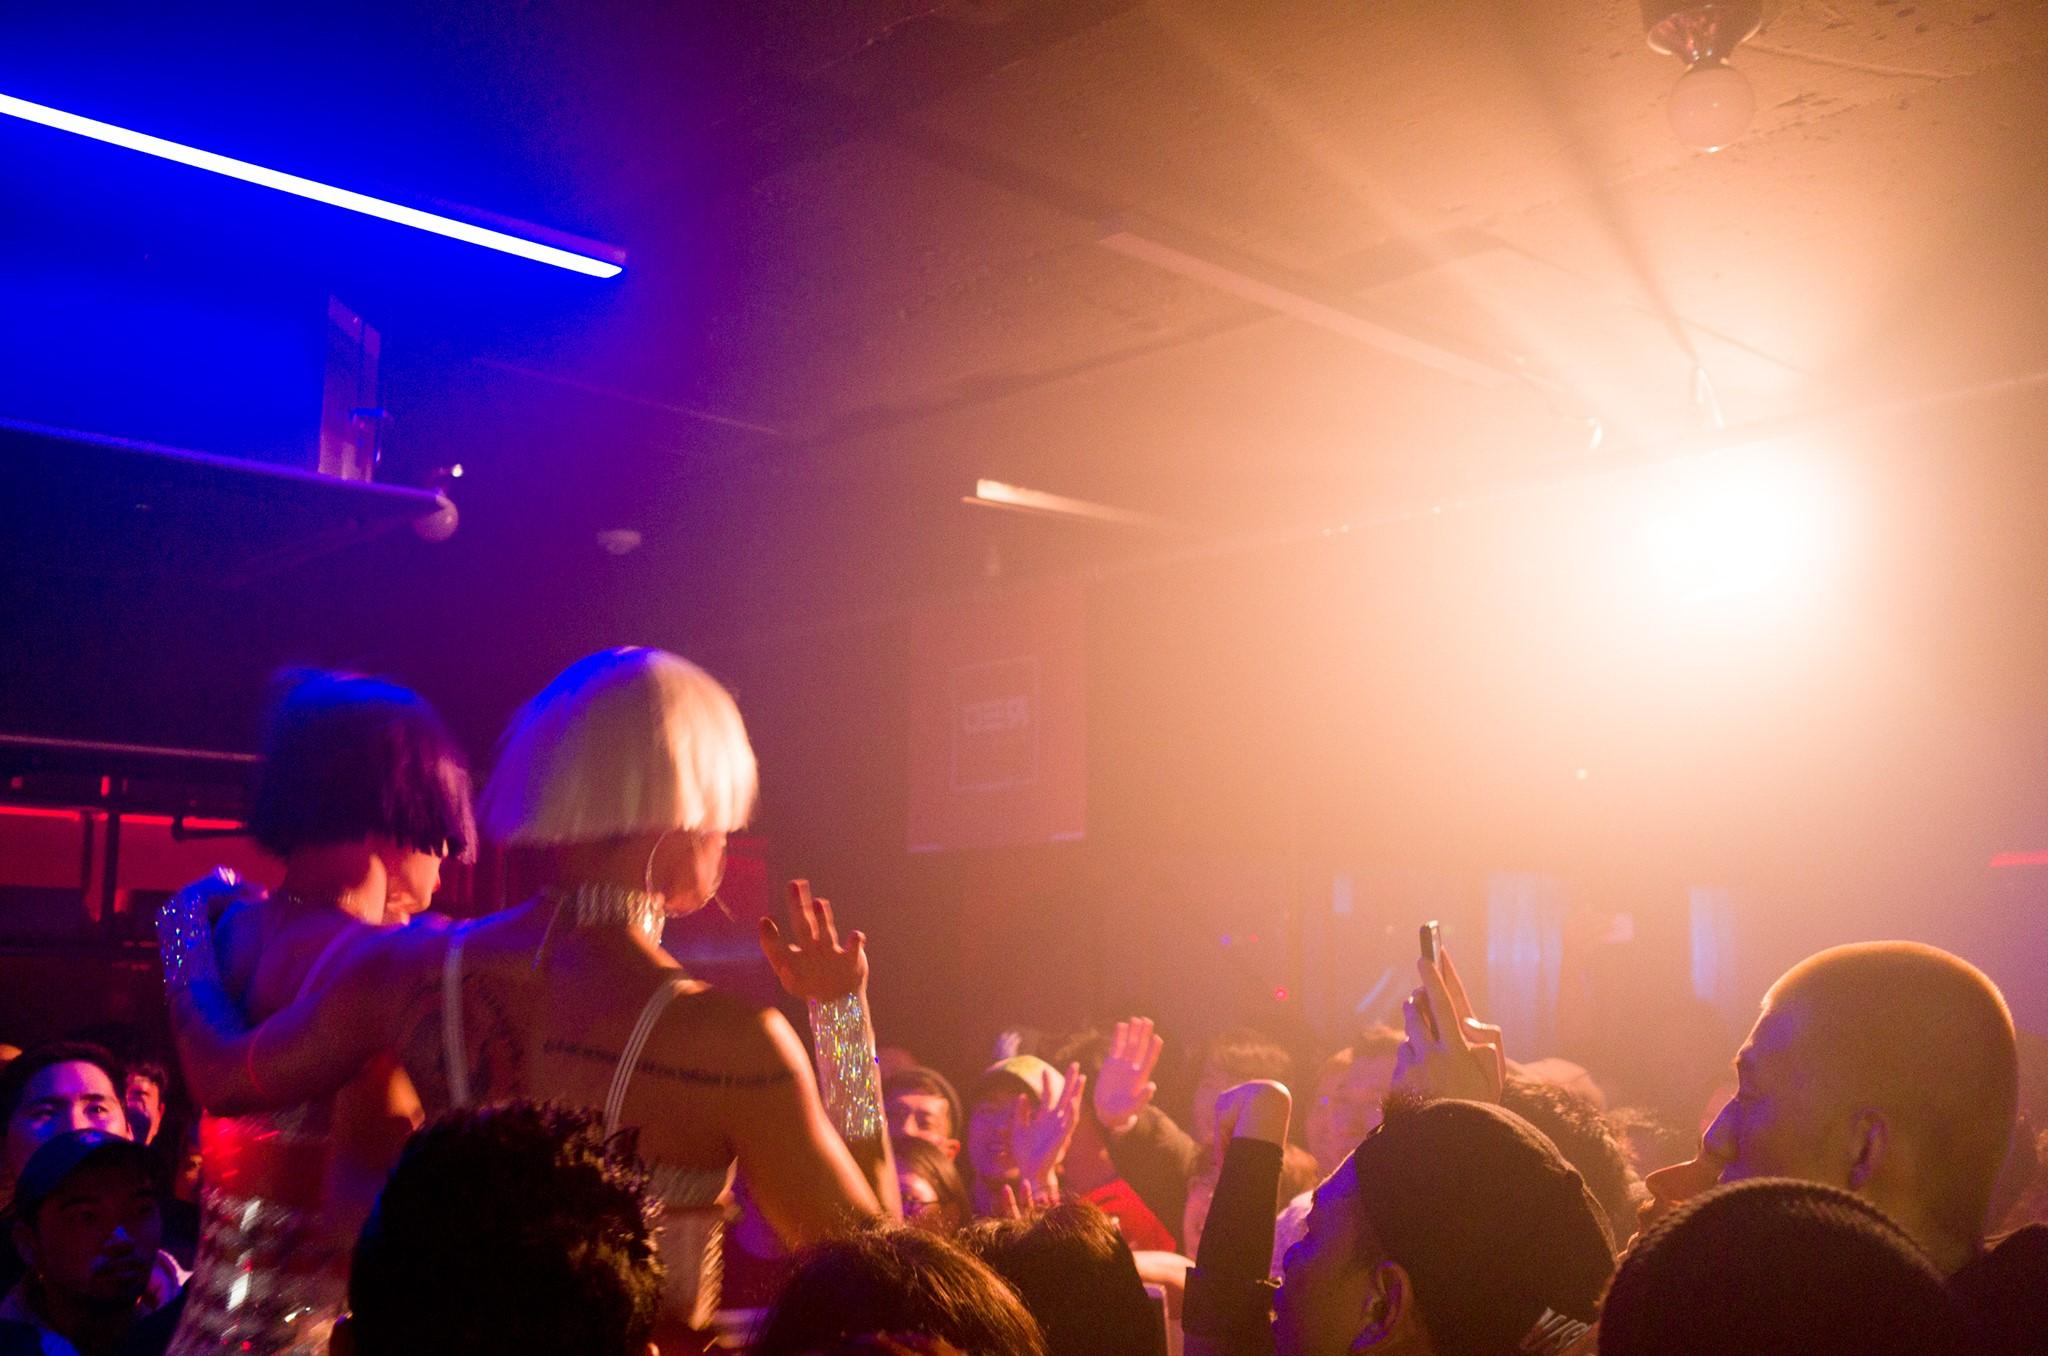 HIV/AIDS 기금 모금 파티인 RED PARTY가 이태원의 LGBT클럽 'Trunk'에서 개최되었다.